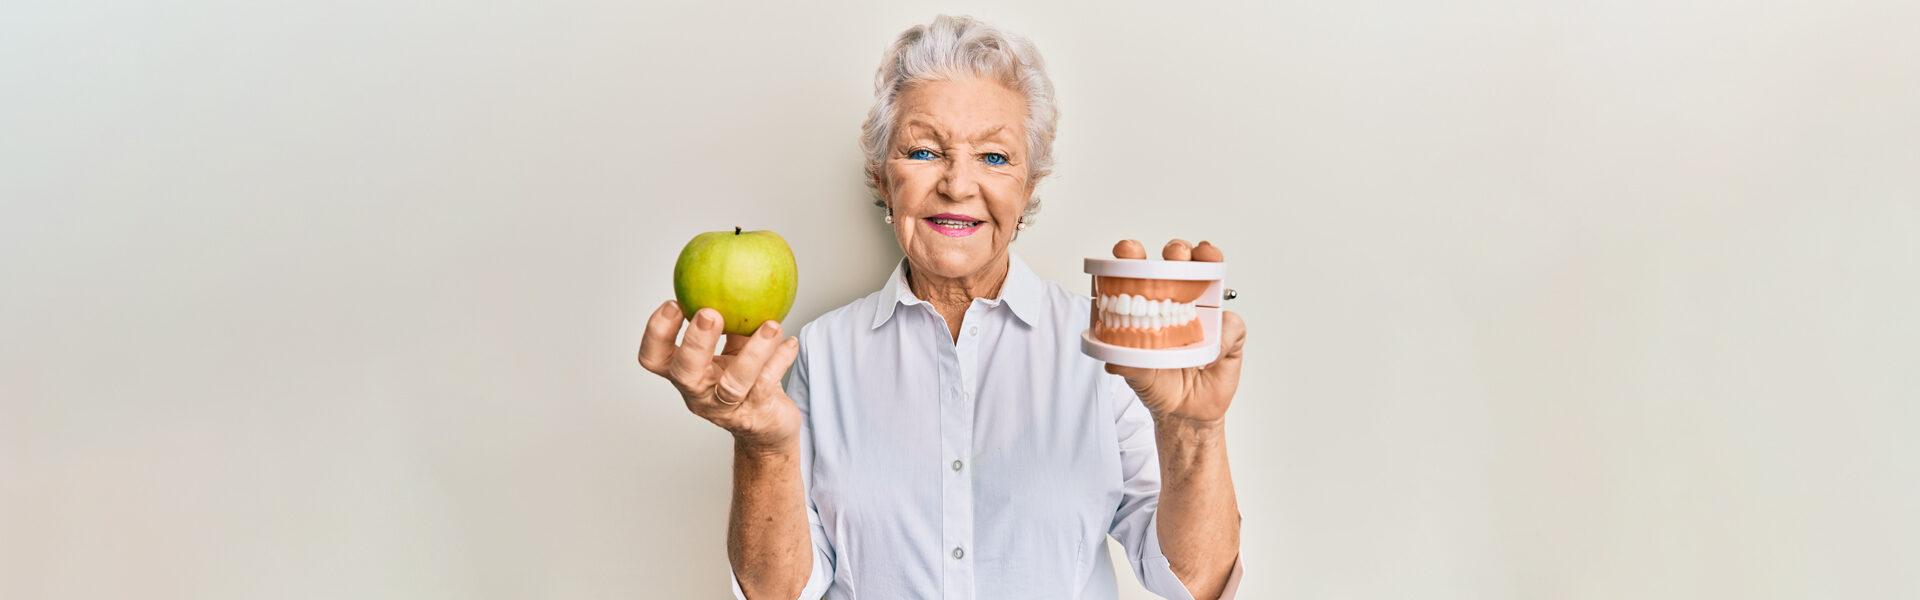 Partials and Full Dentures in Auburn, WA - Dentures Near You